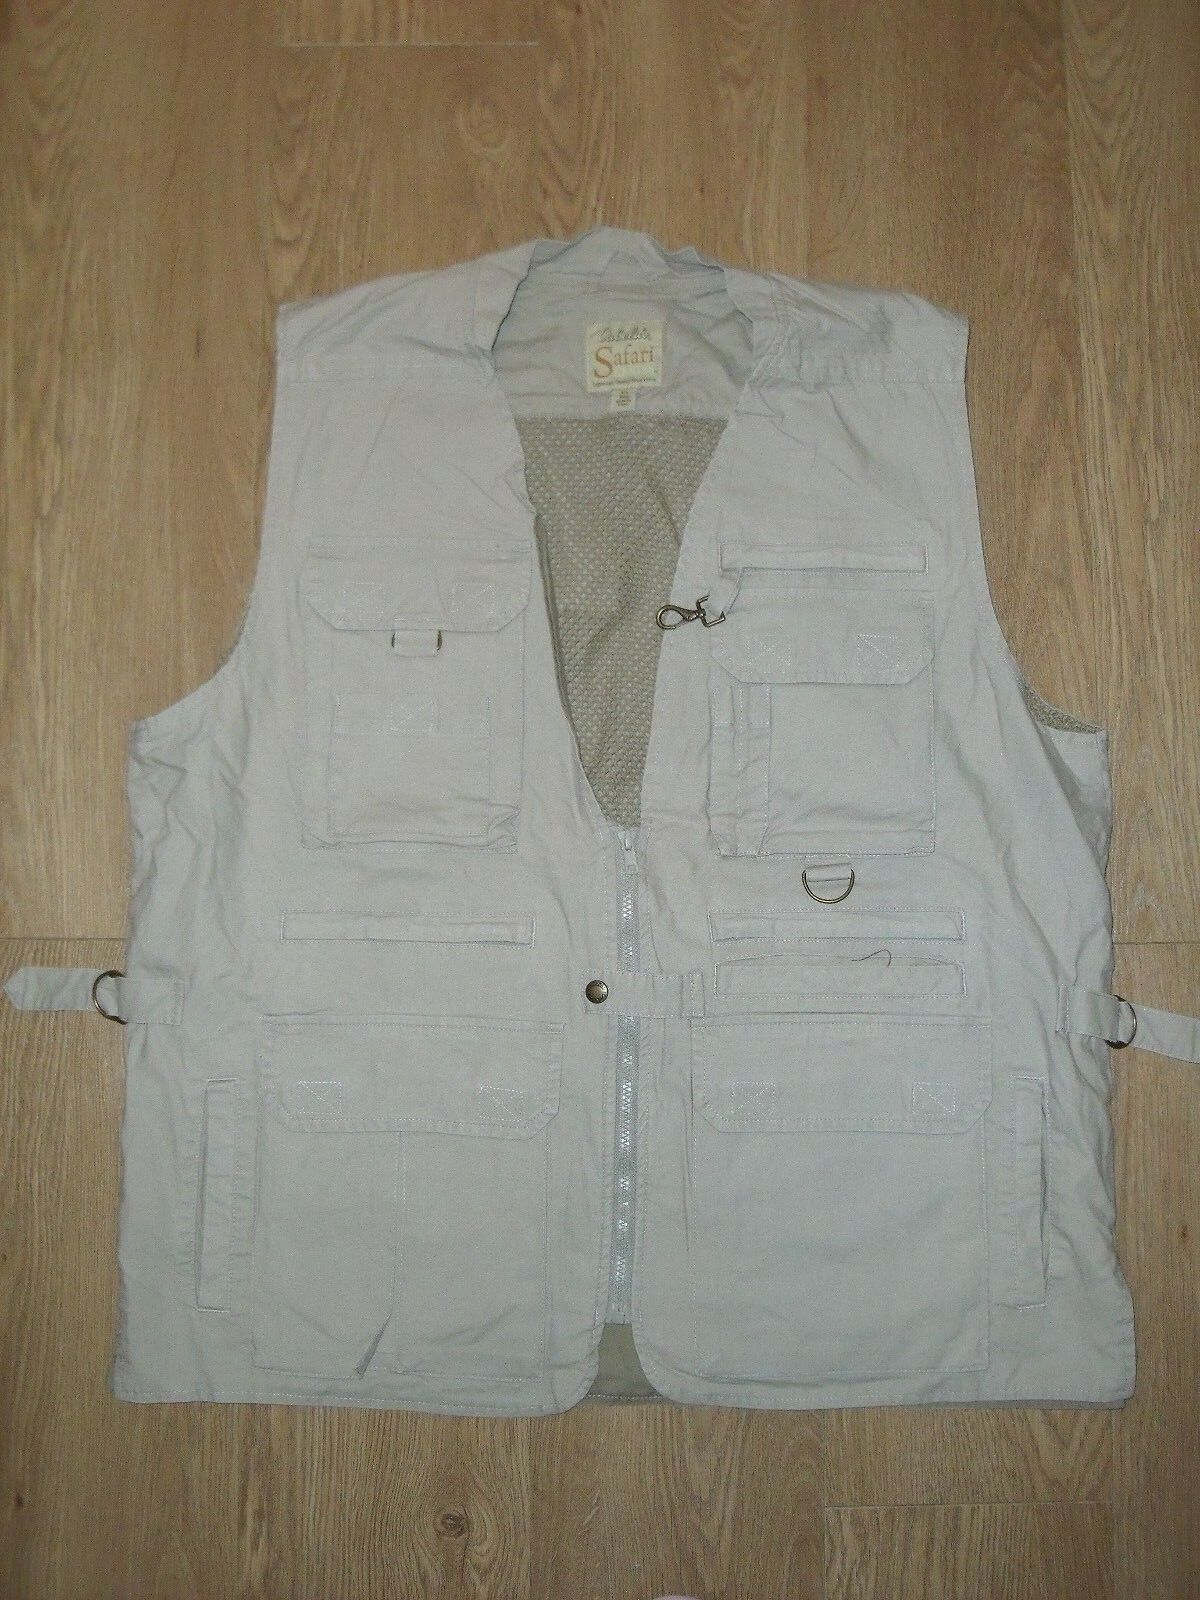 Cabela's Men's Safari Vest Hunting Pigeon Shooting Fishing Top Beige Khaki XL